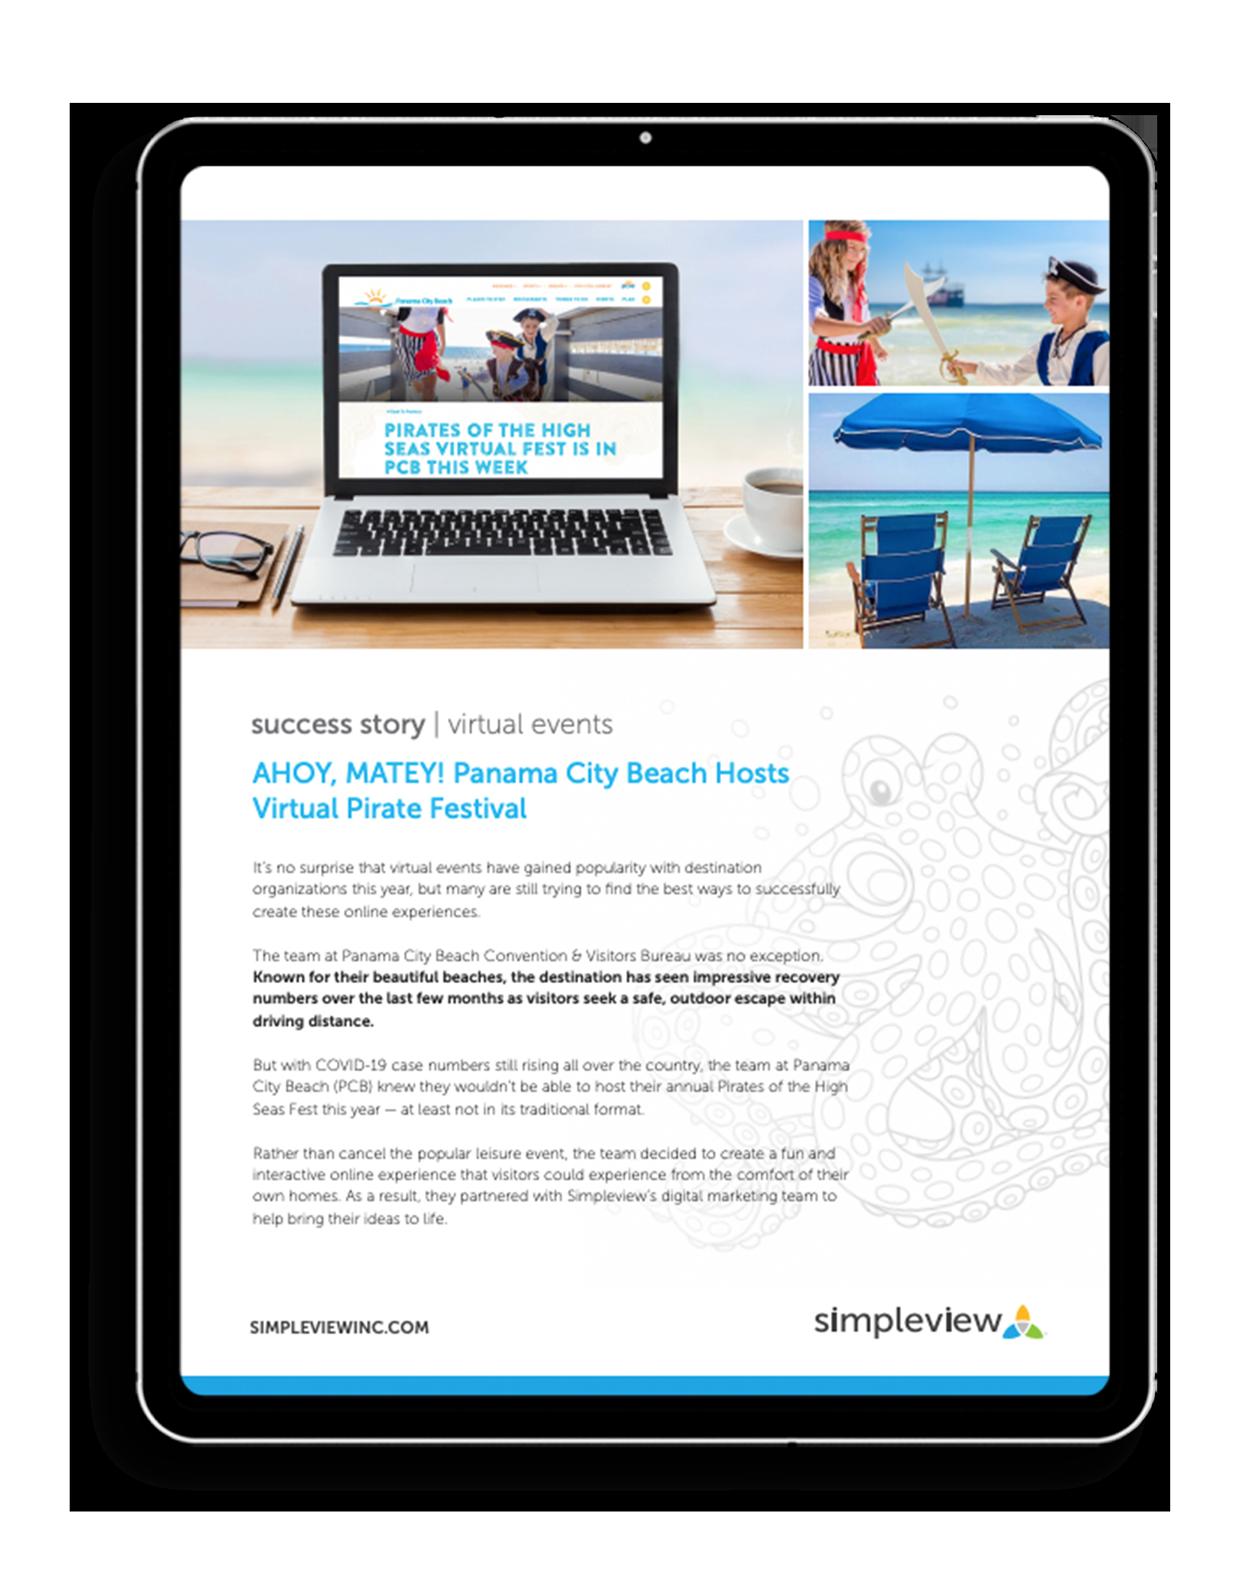 Panama-City-Beach-Hosts-Virtual-Pirate-Festival